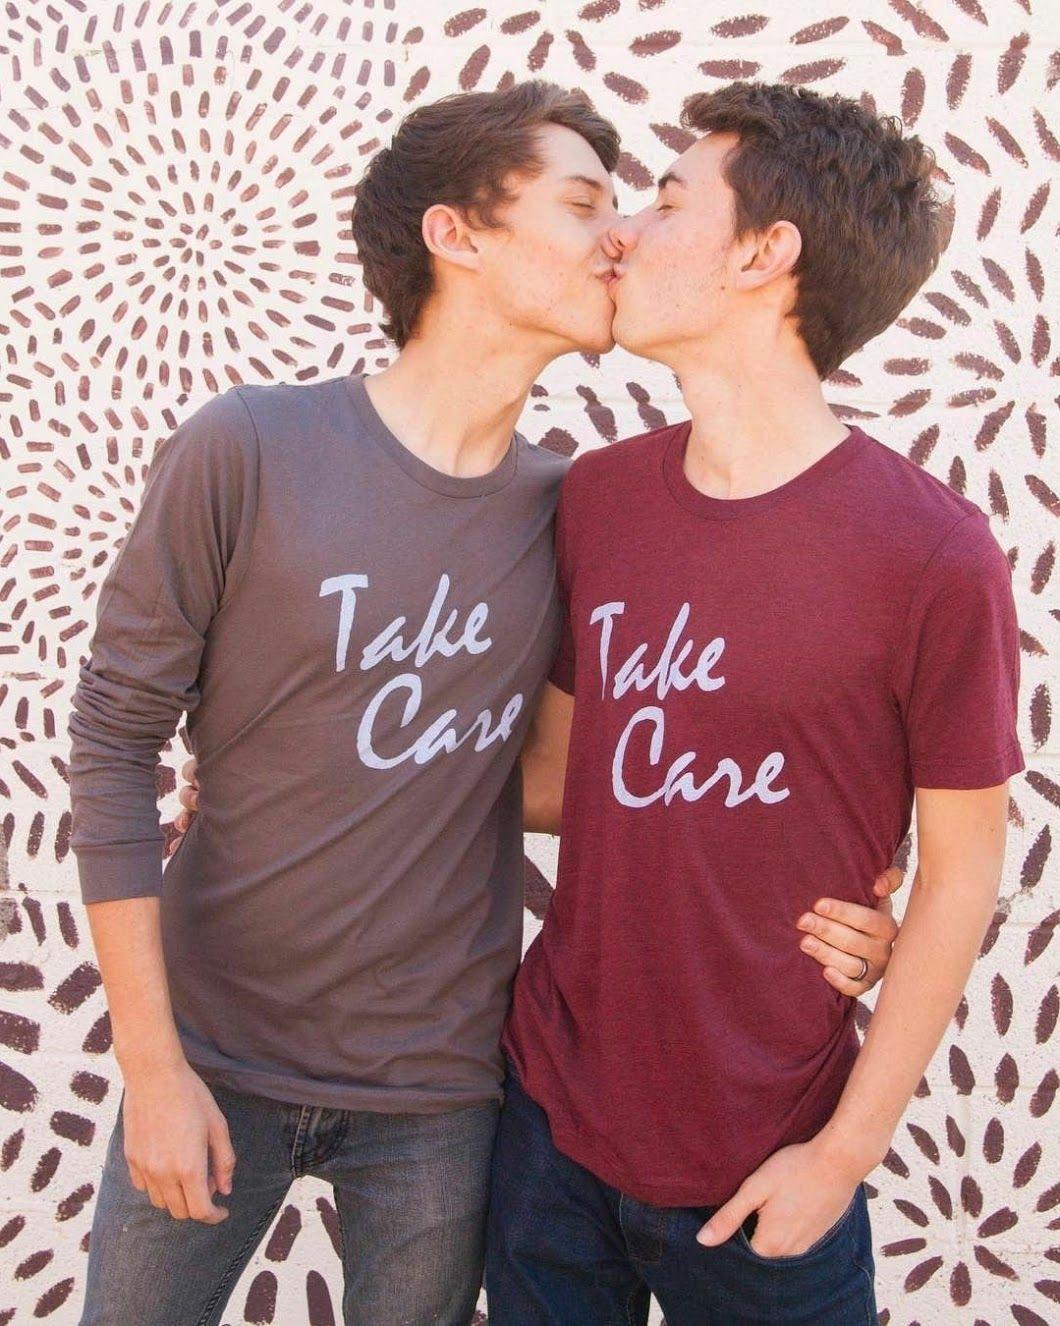 Gayteen pics